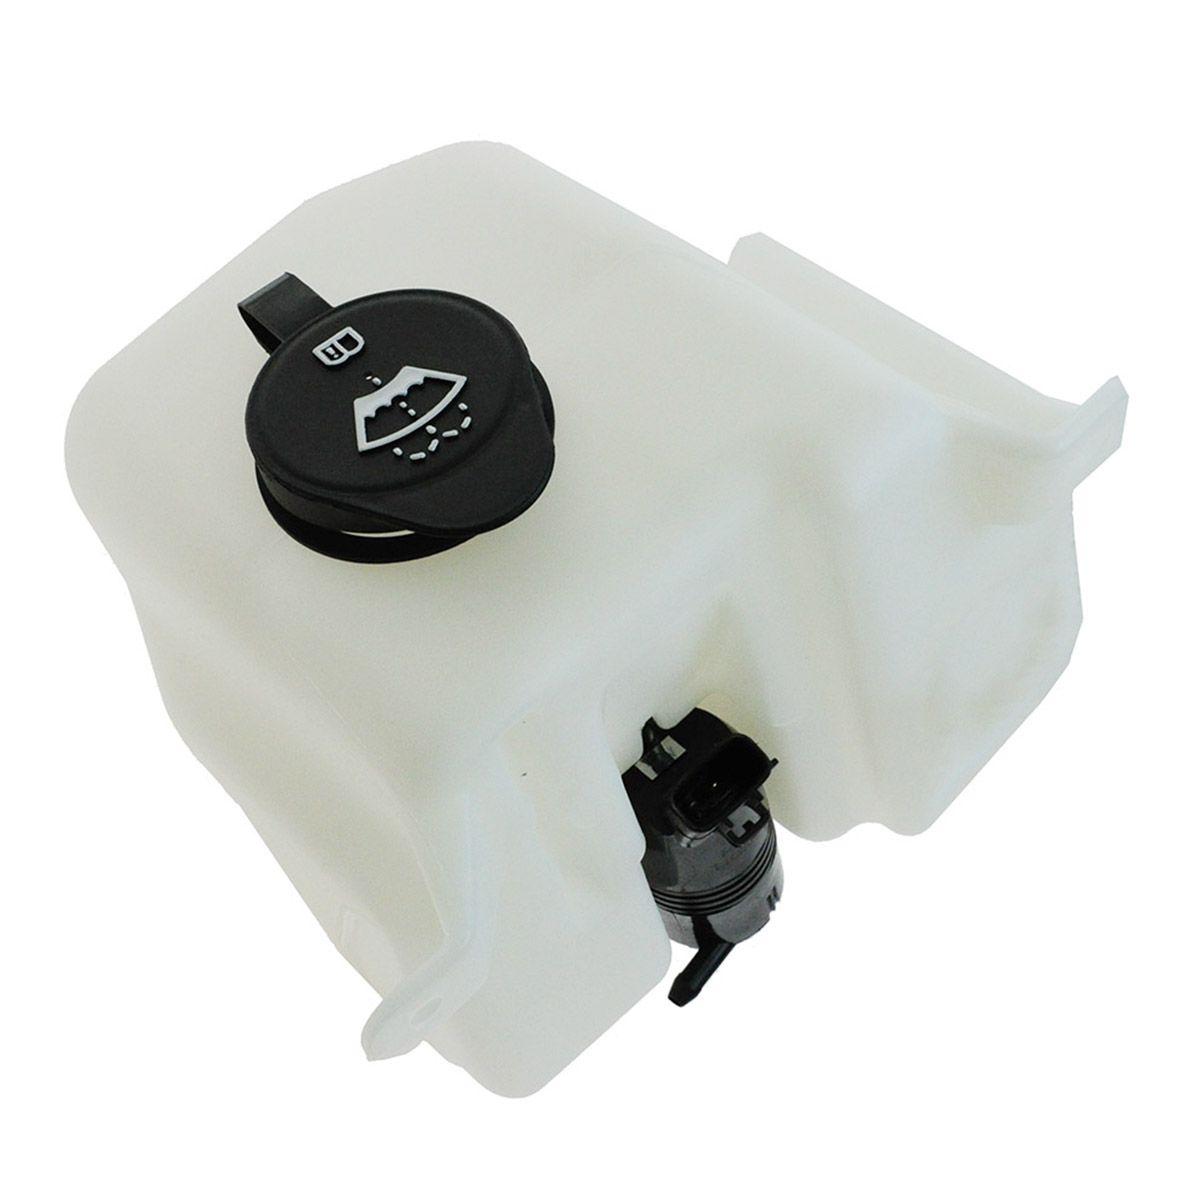 Windshield Washer Reservoir Bottle with Pump for 89-95 Toyota Pickup US Models